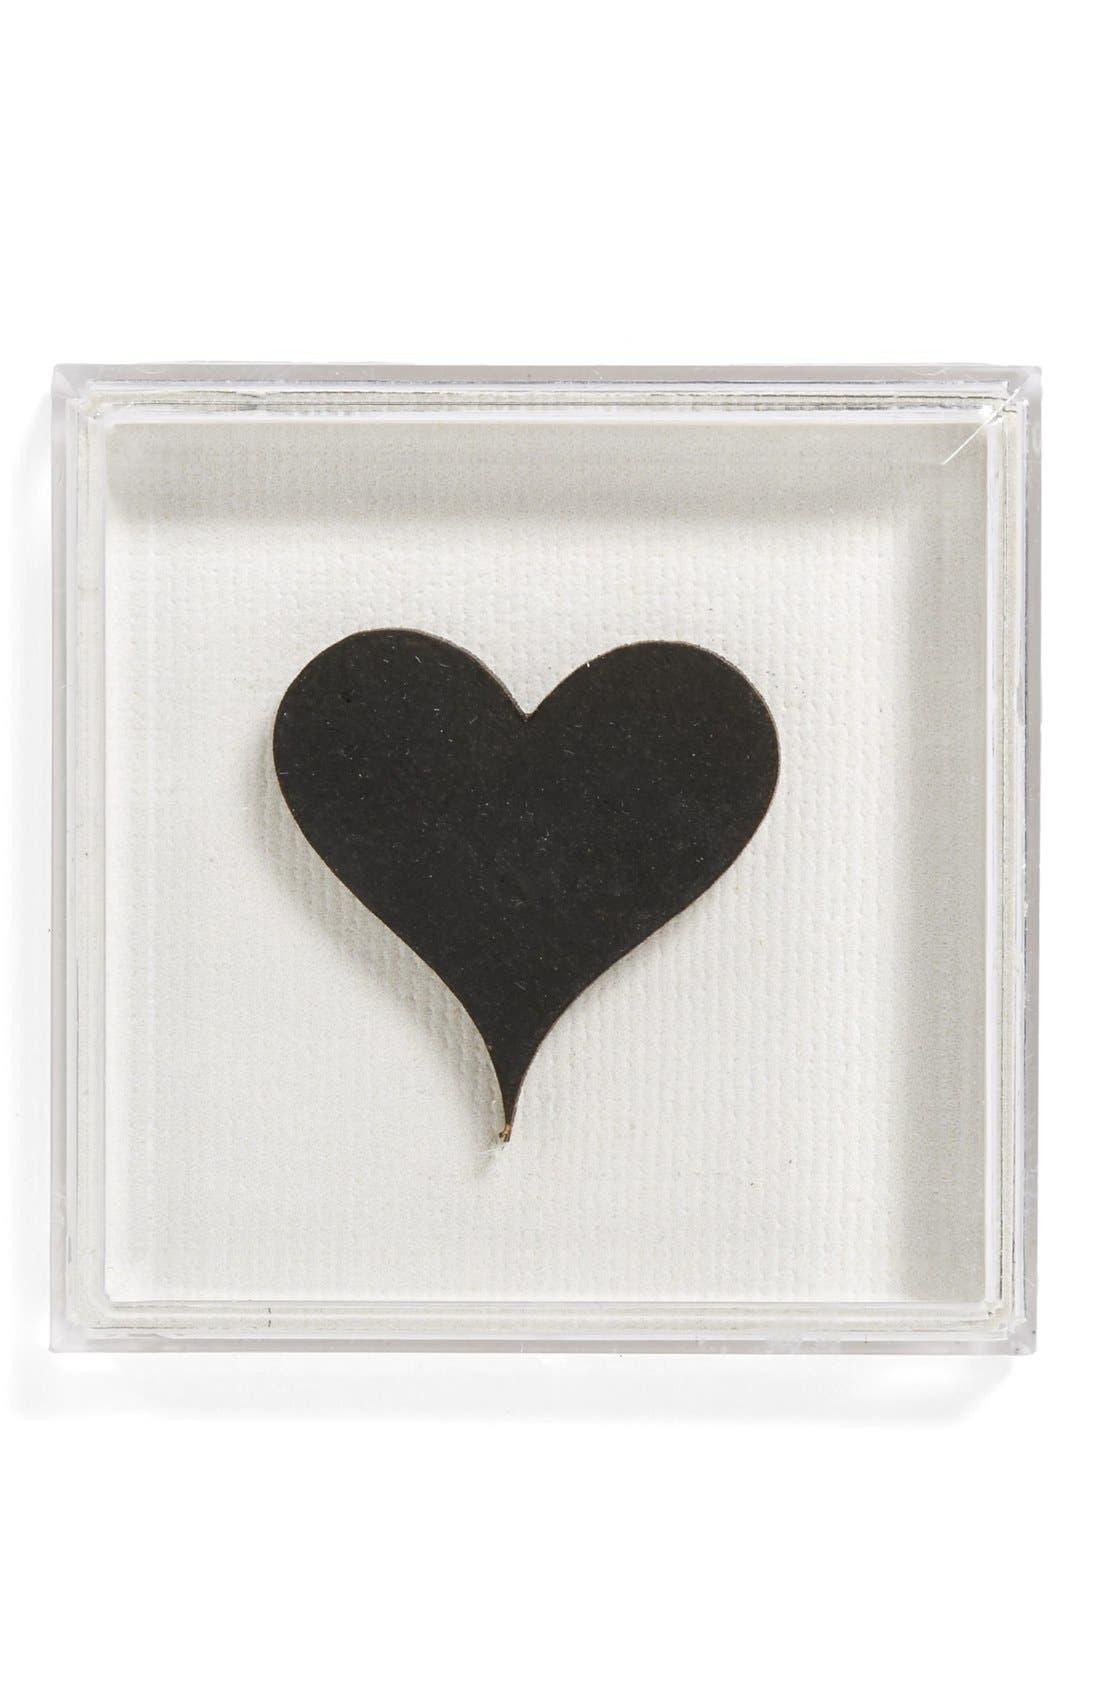 Alternate Image 1 Selected - Petal Lane 'Heart' Magnet